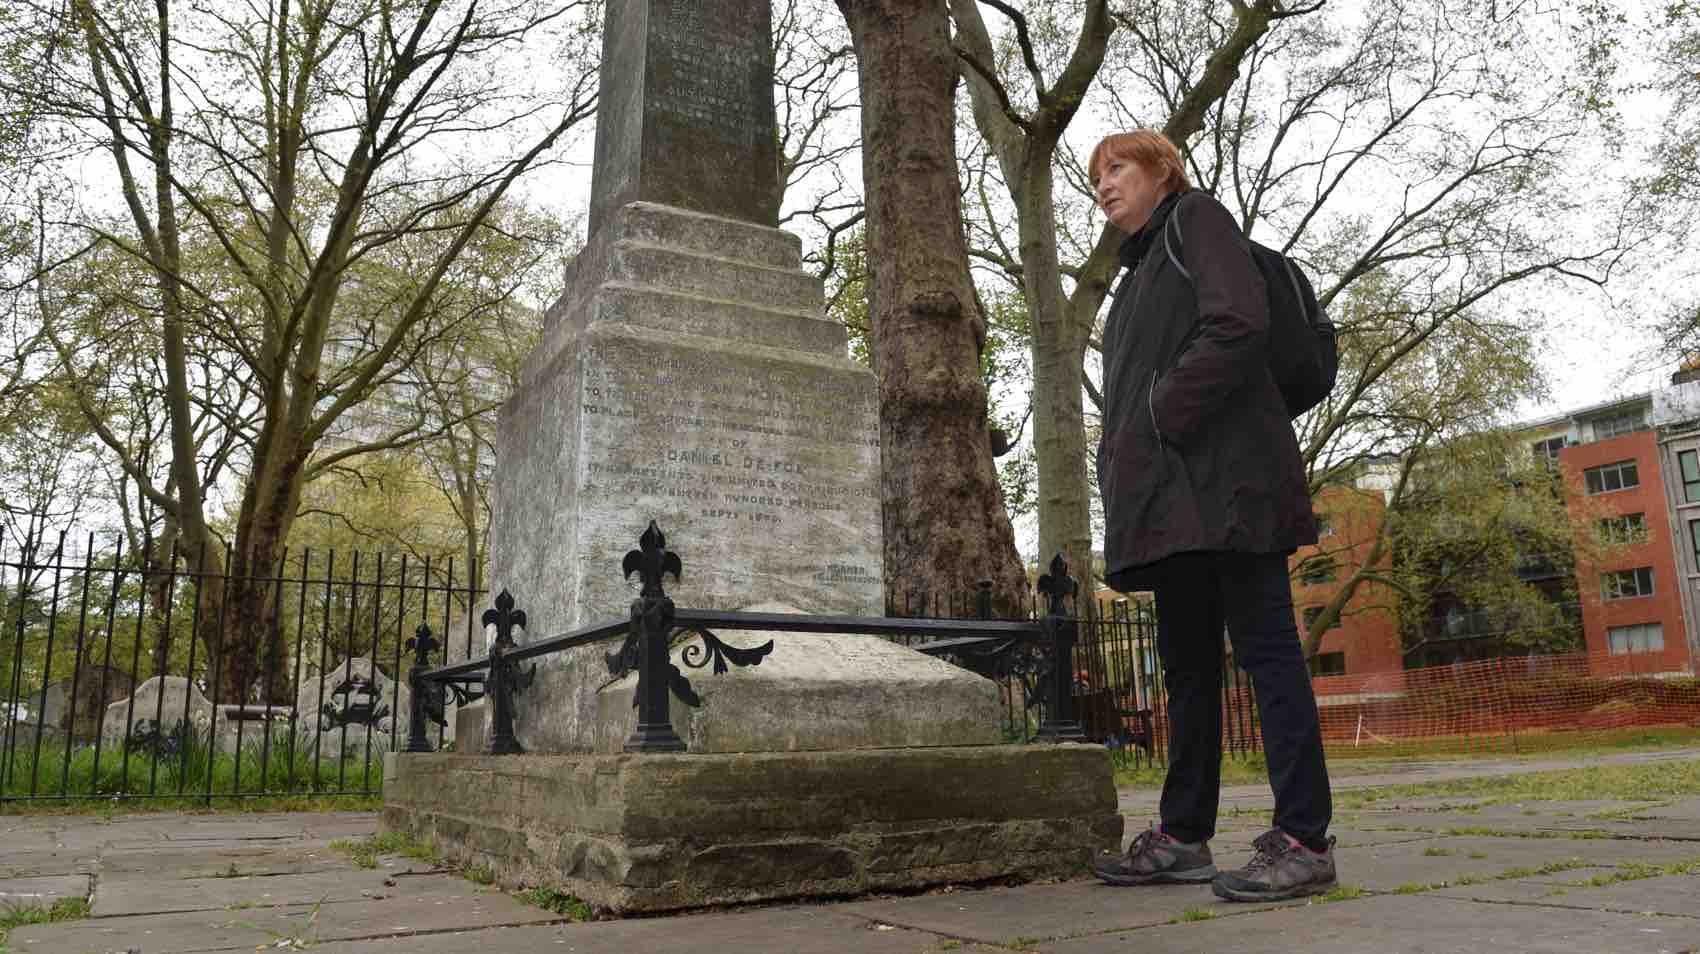 Here lies Daniel Defoe – not exactly. But near at Bunhill Fields Burial Ground